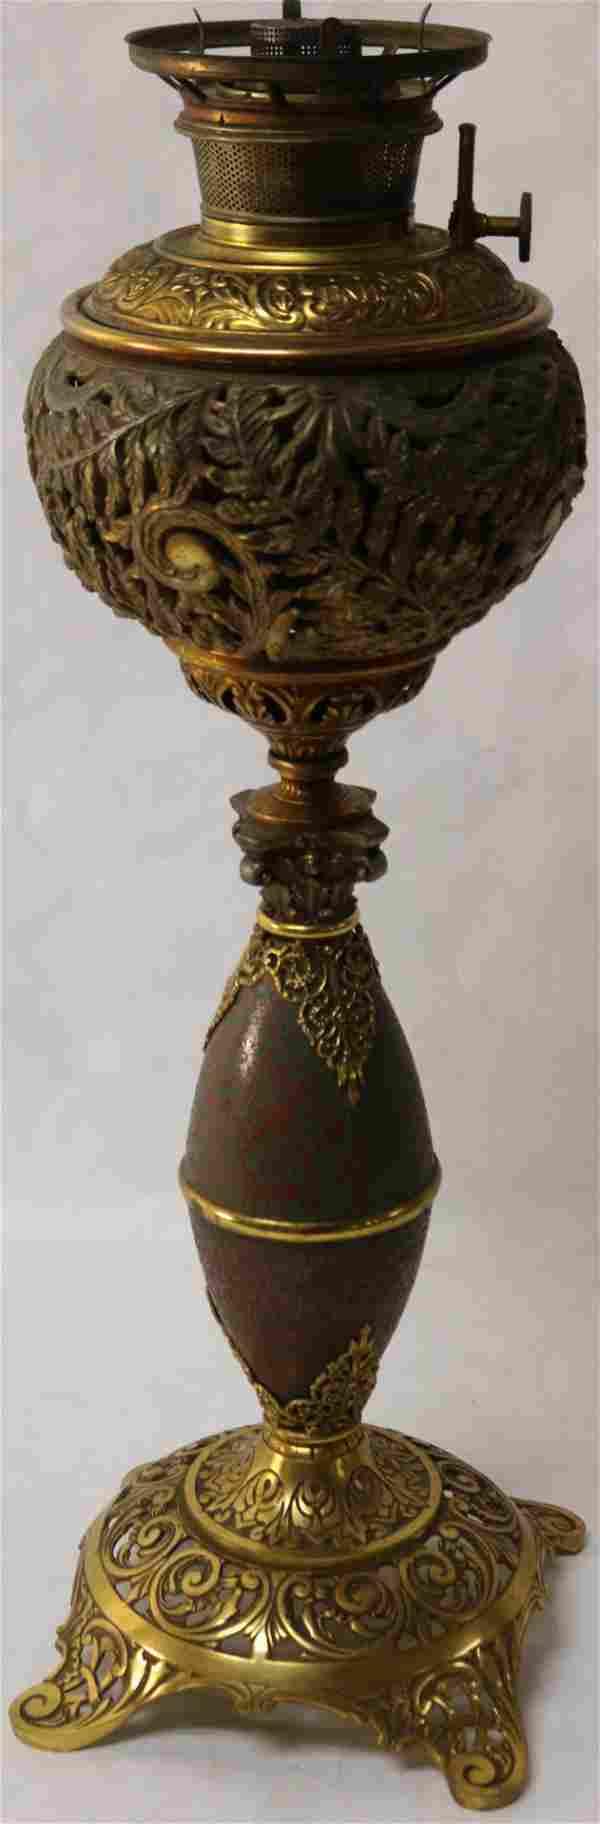 ORNATE B & H BANQUET LAMP, ORNATE LEAF & SCROLL